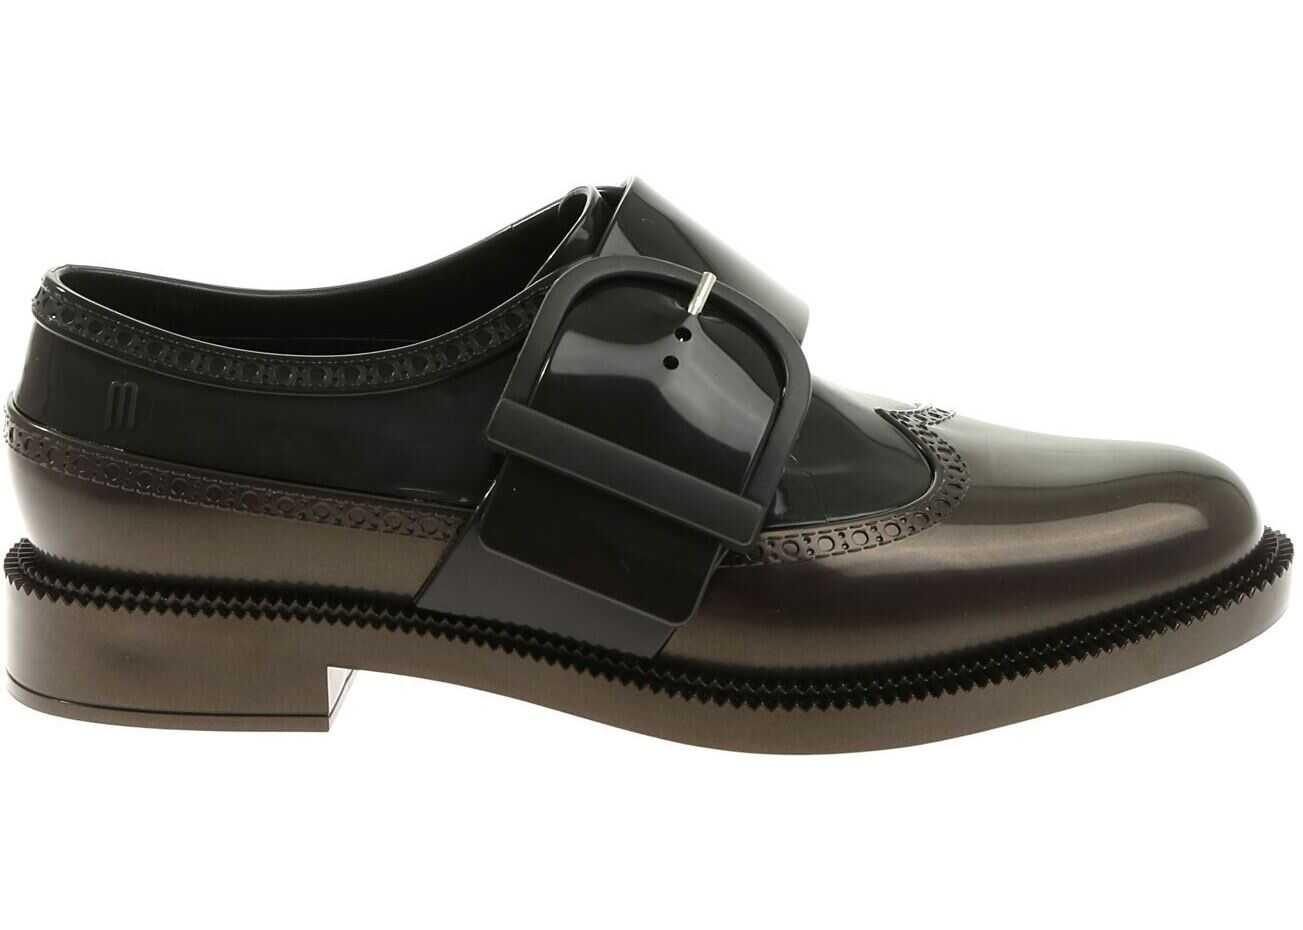 MELISSA Classic Brogue Special Black Shoes 32394 50870 Black imagine b-mall.ro